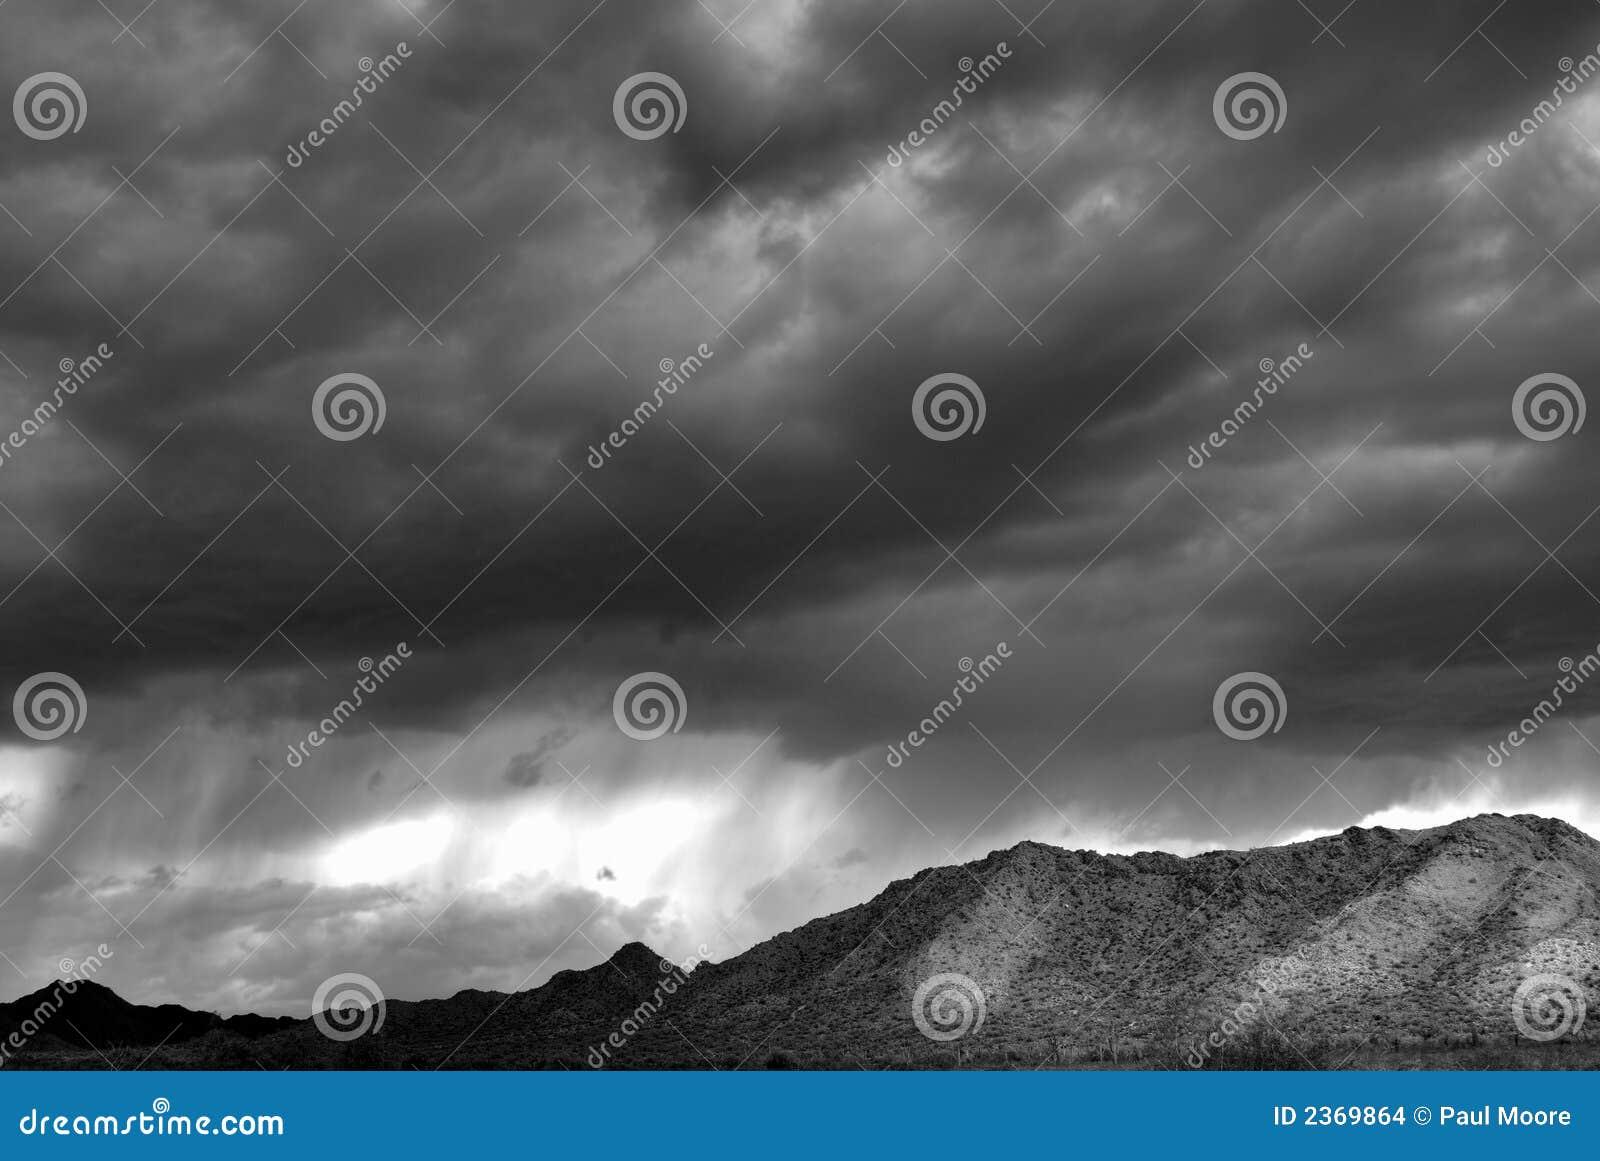 Montaña del desierto